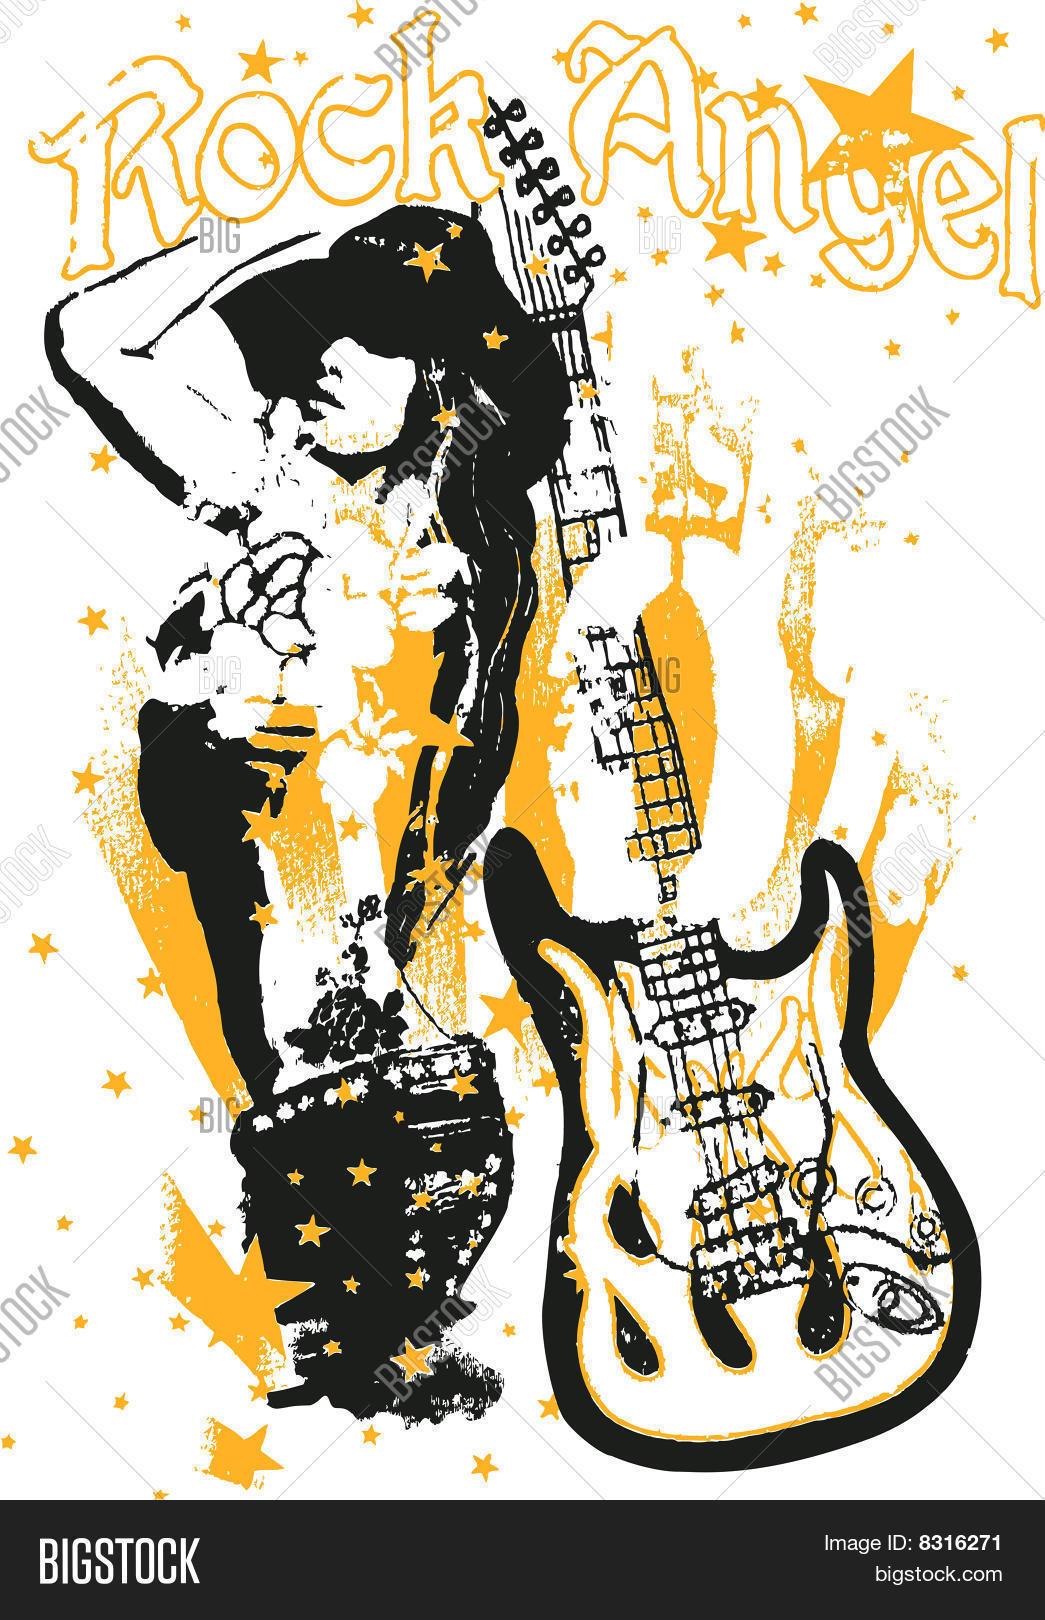 Poster design music - Music Poster Design